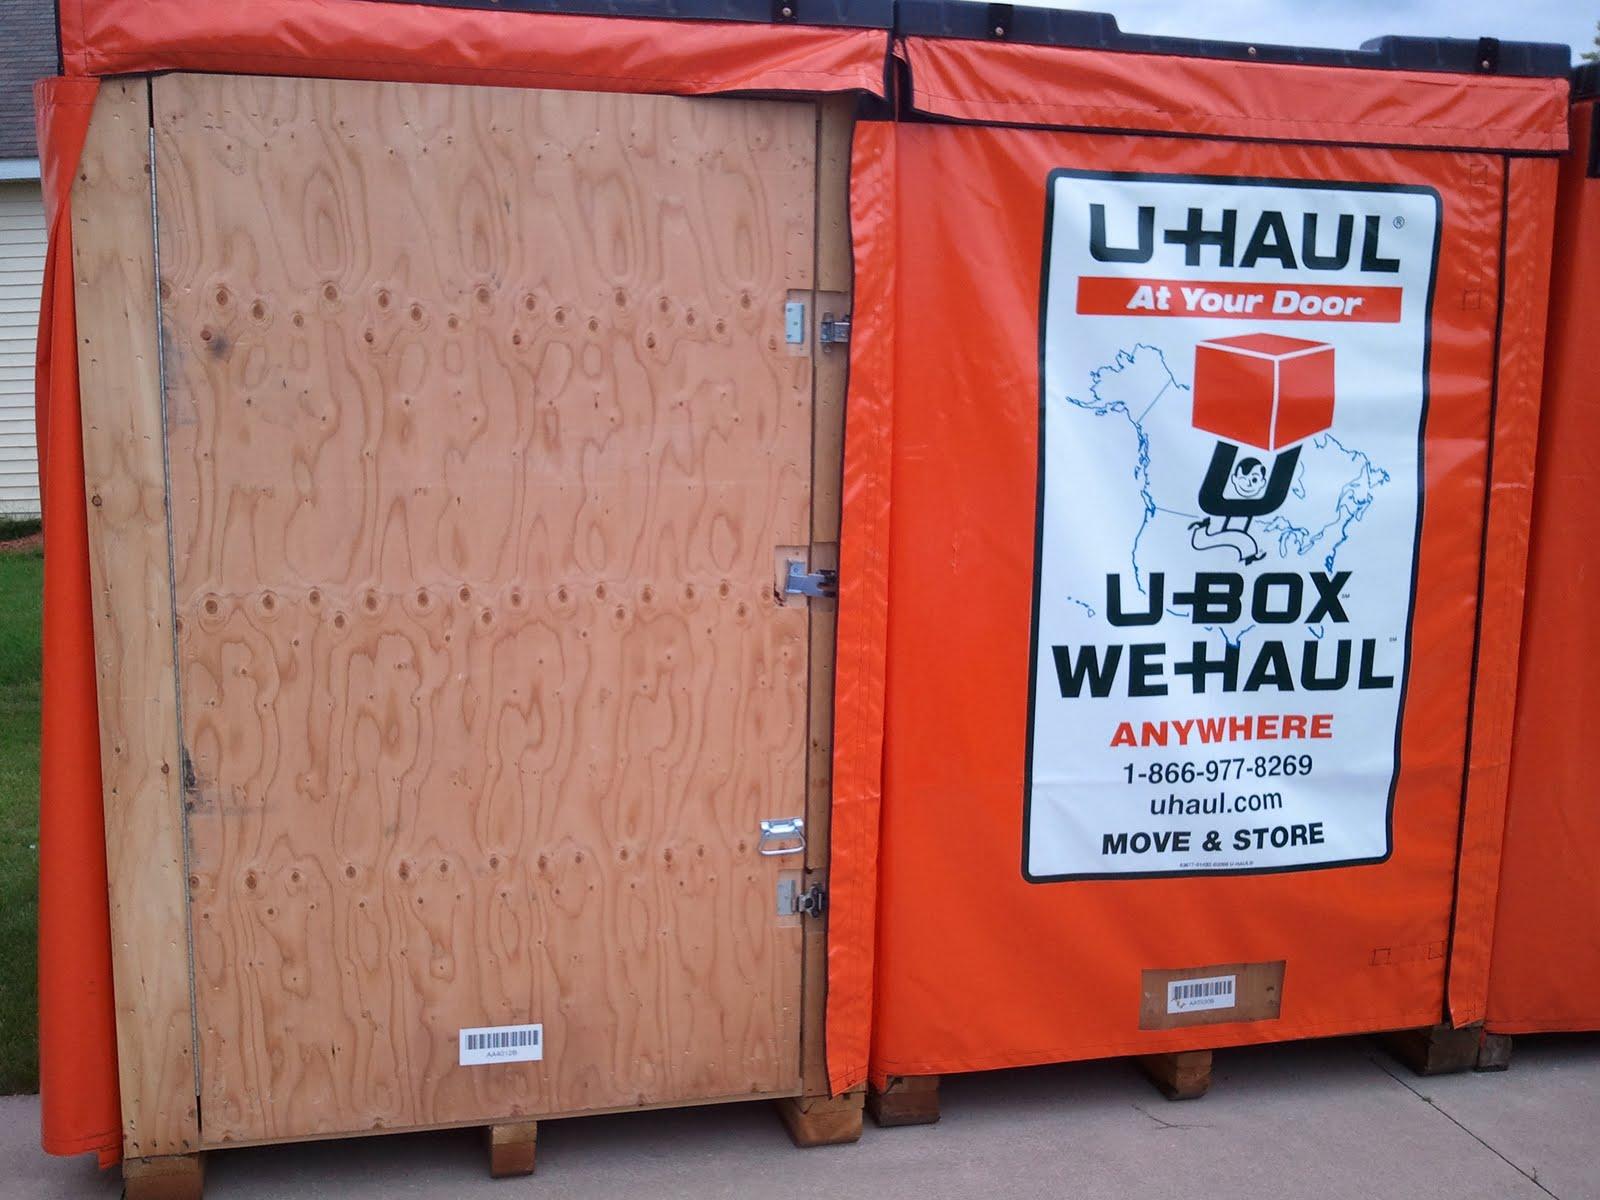 West Michigan Self Storage: U-Haul U-Box Dimensions